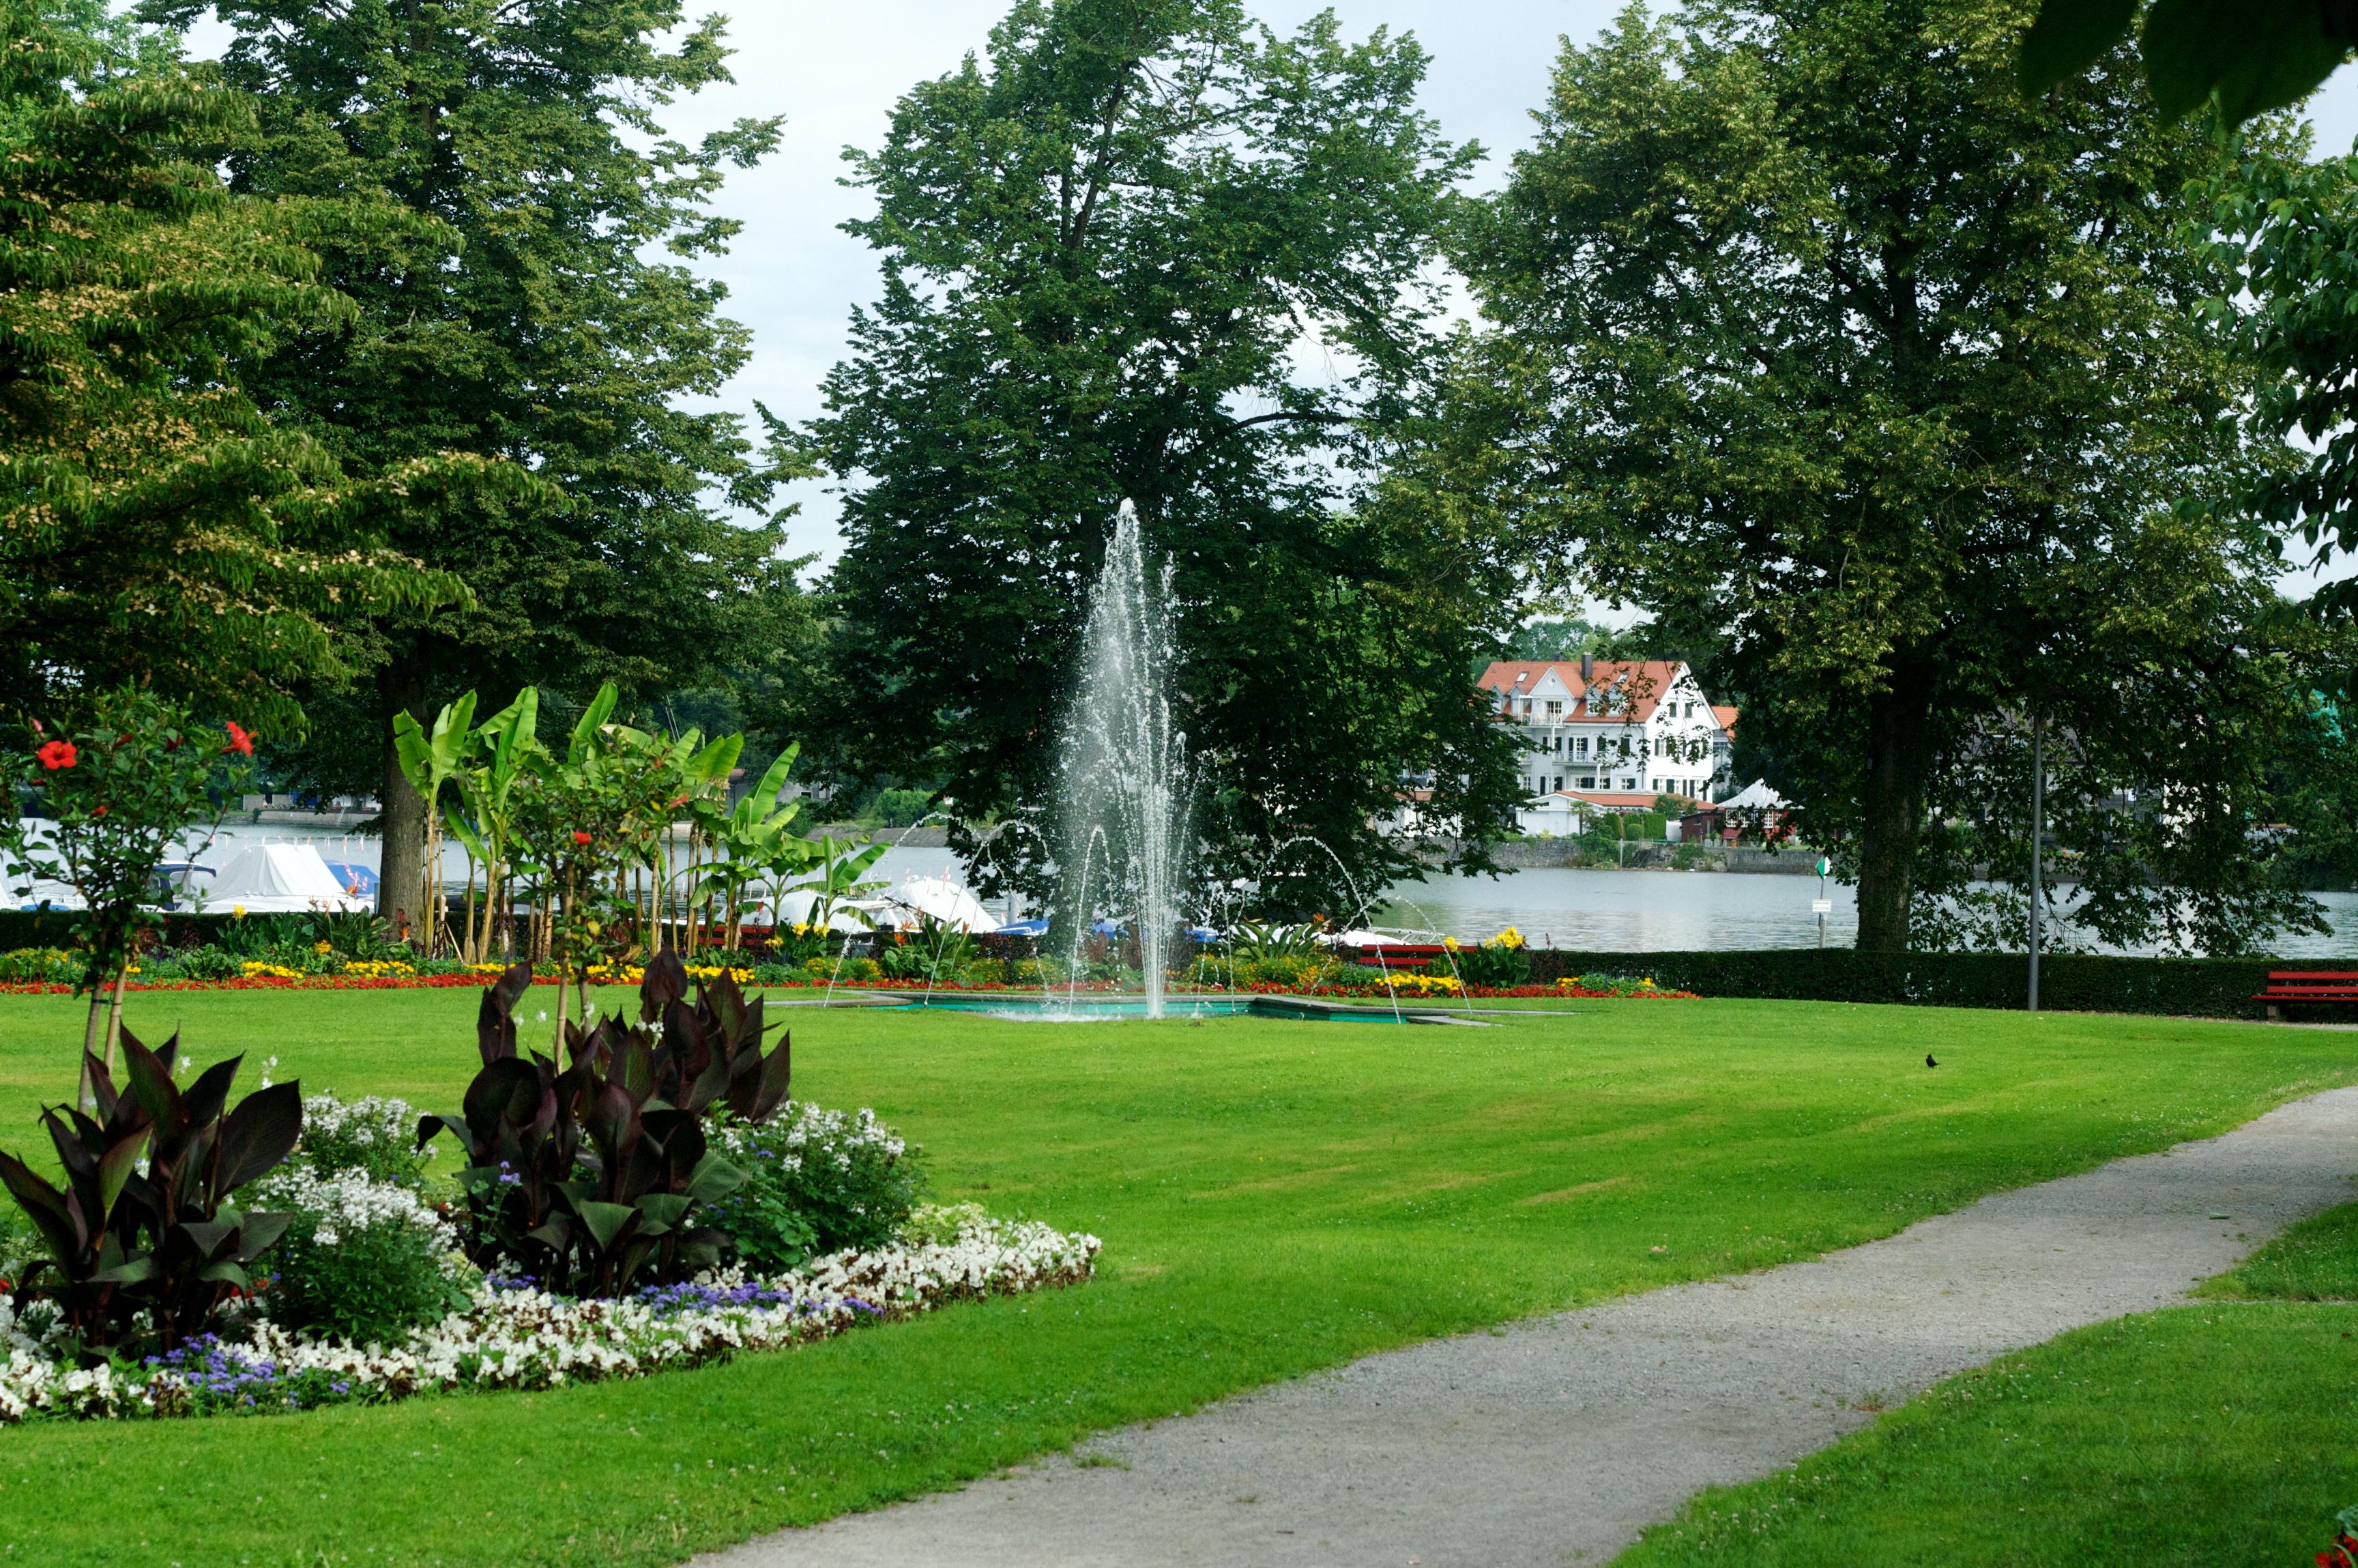 Park near Inselhalle, Lindau